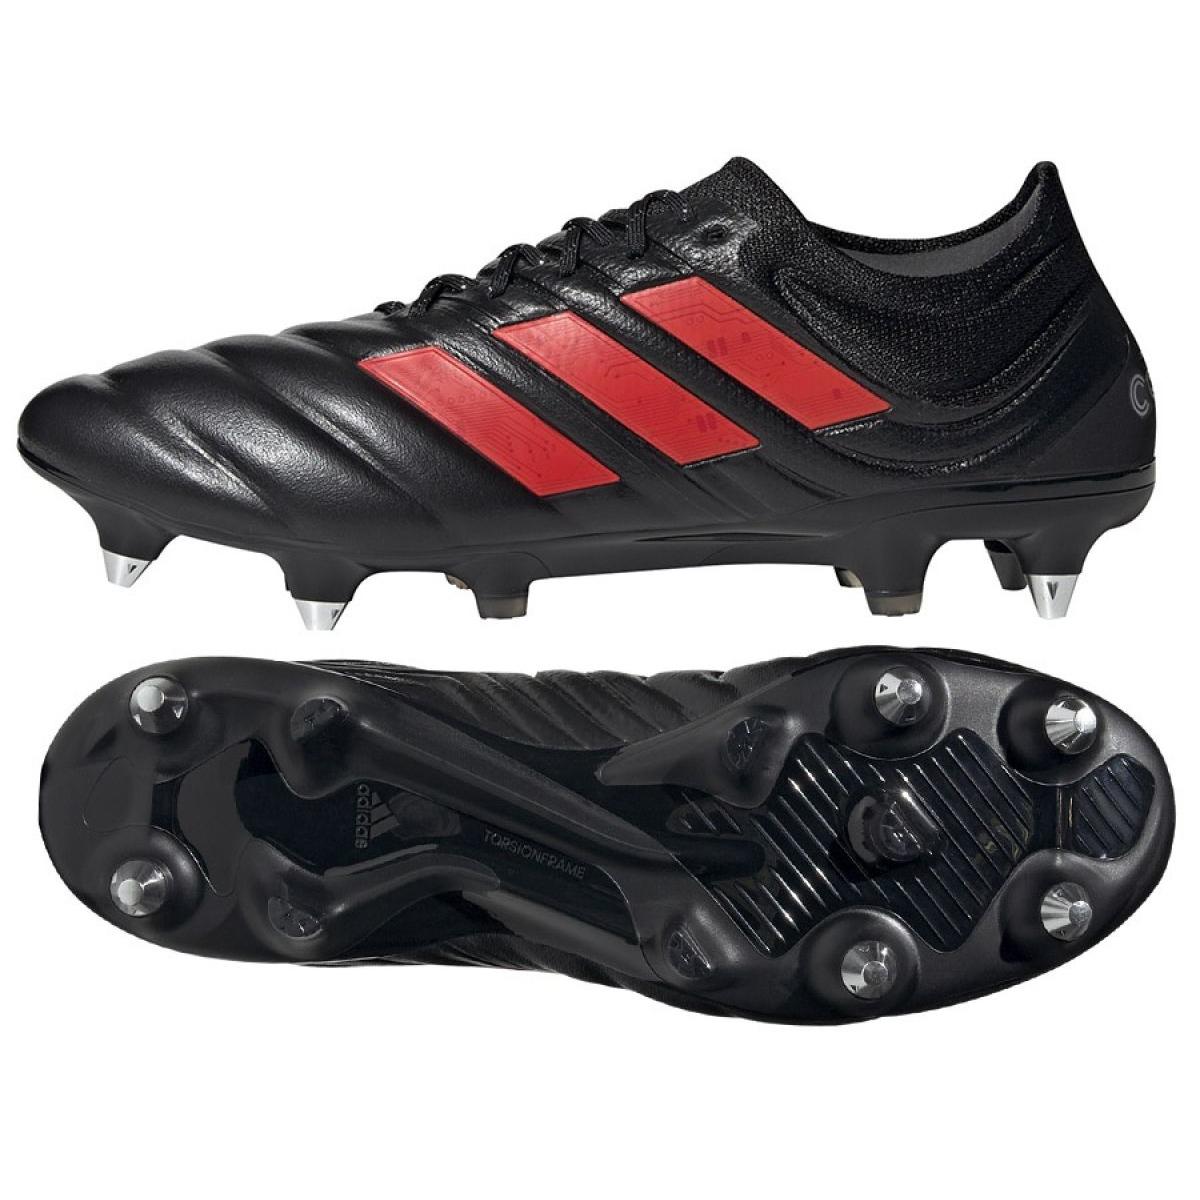 Adidas Copa 19.1 Sg M G26642 voetbalschoenen zwart, rood zwart